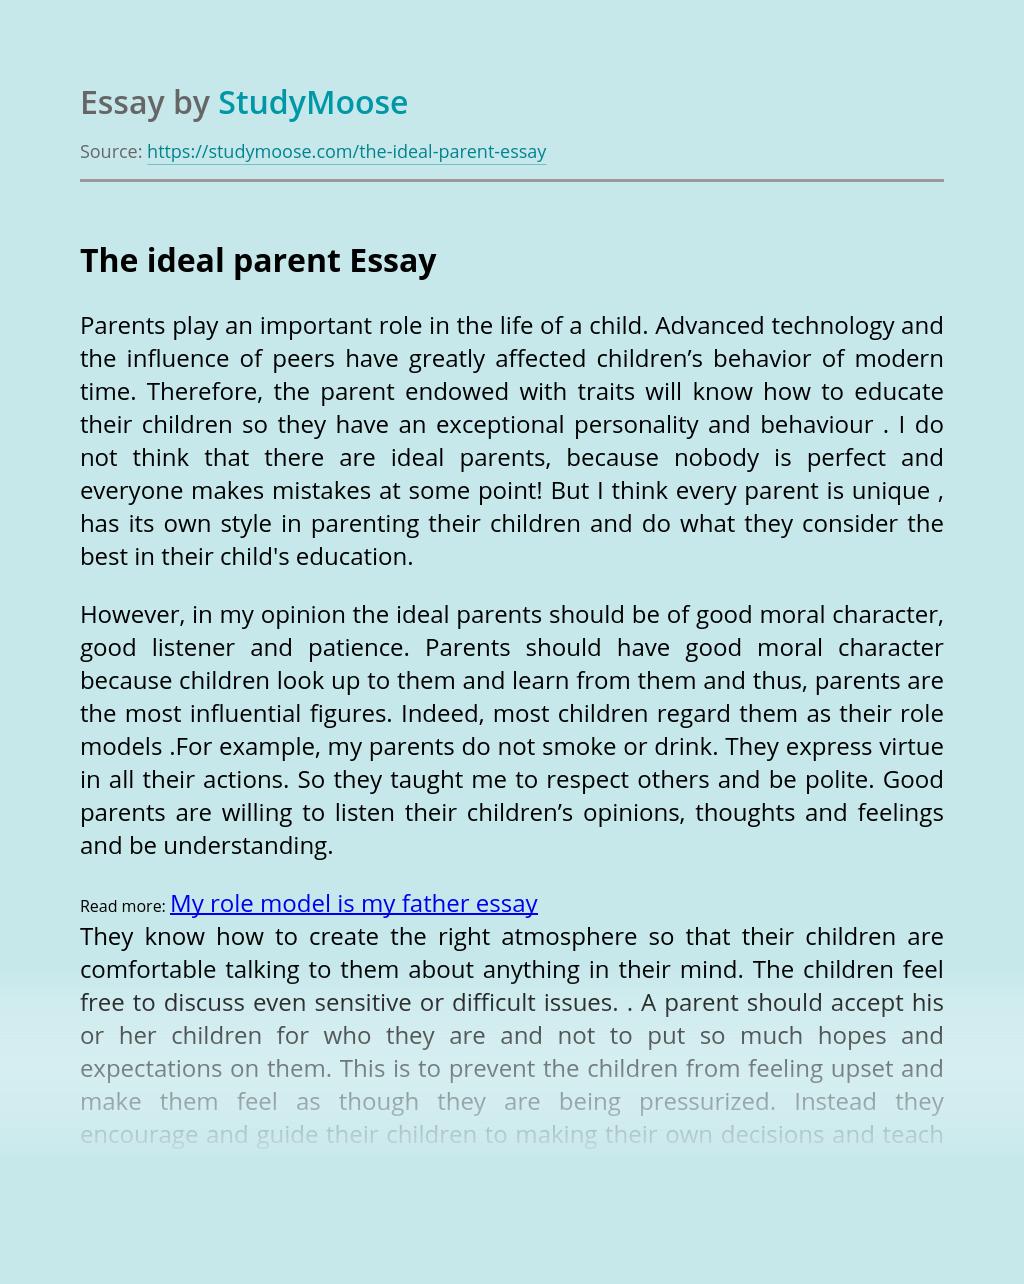 The ideal parent